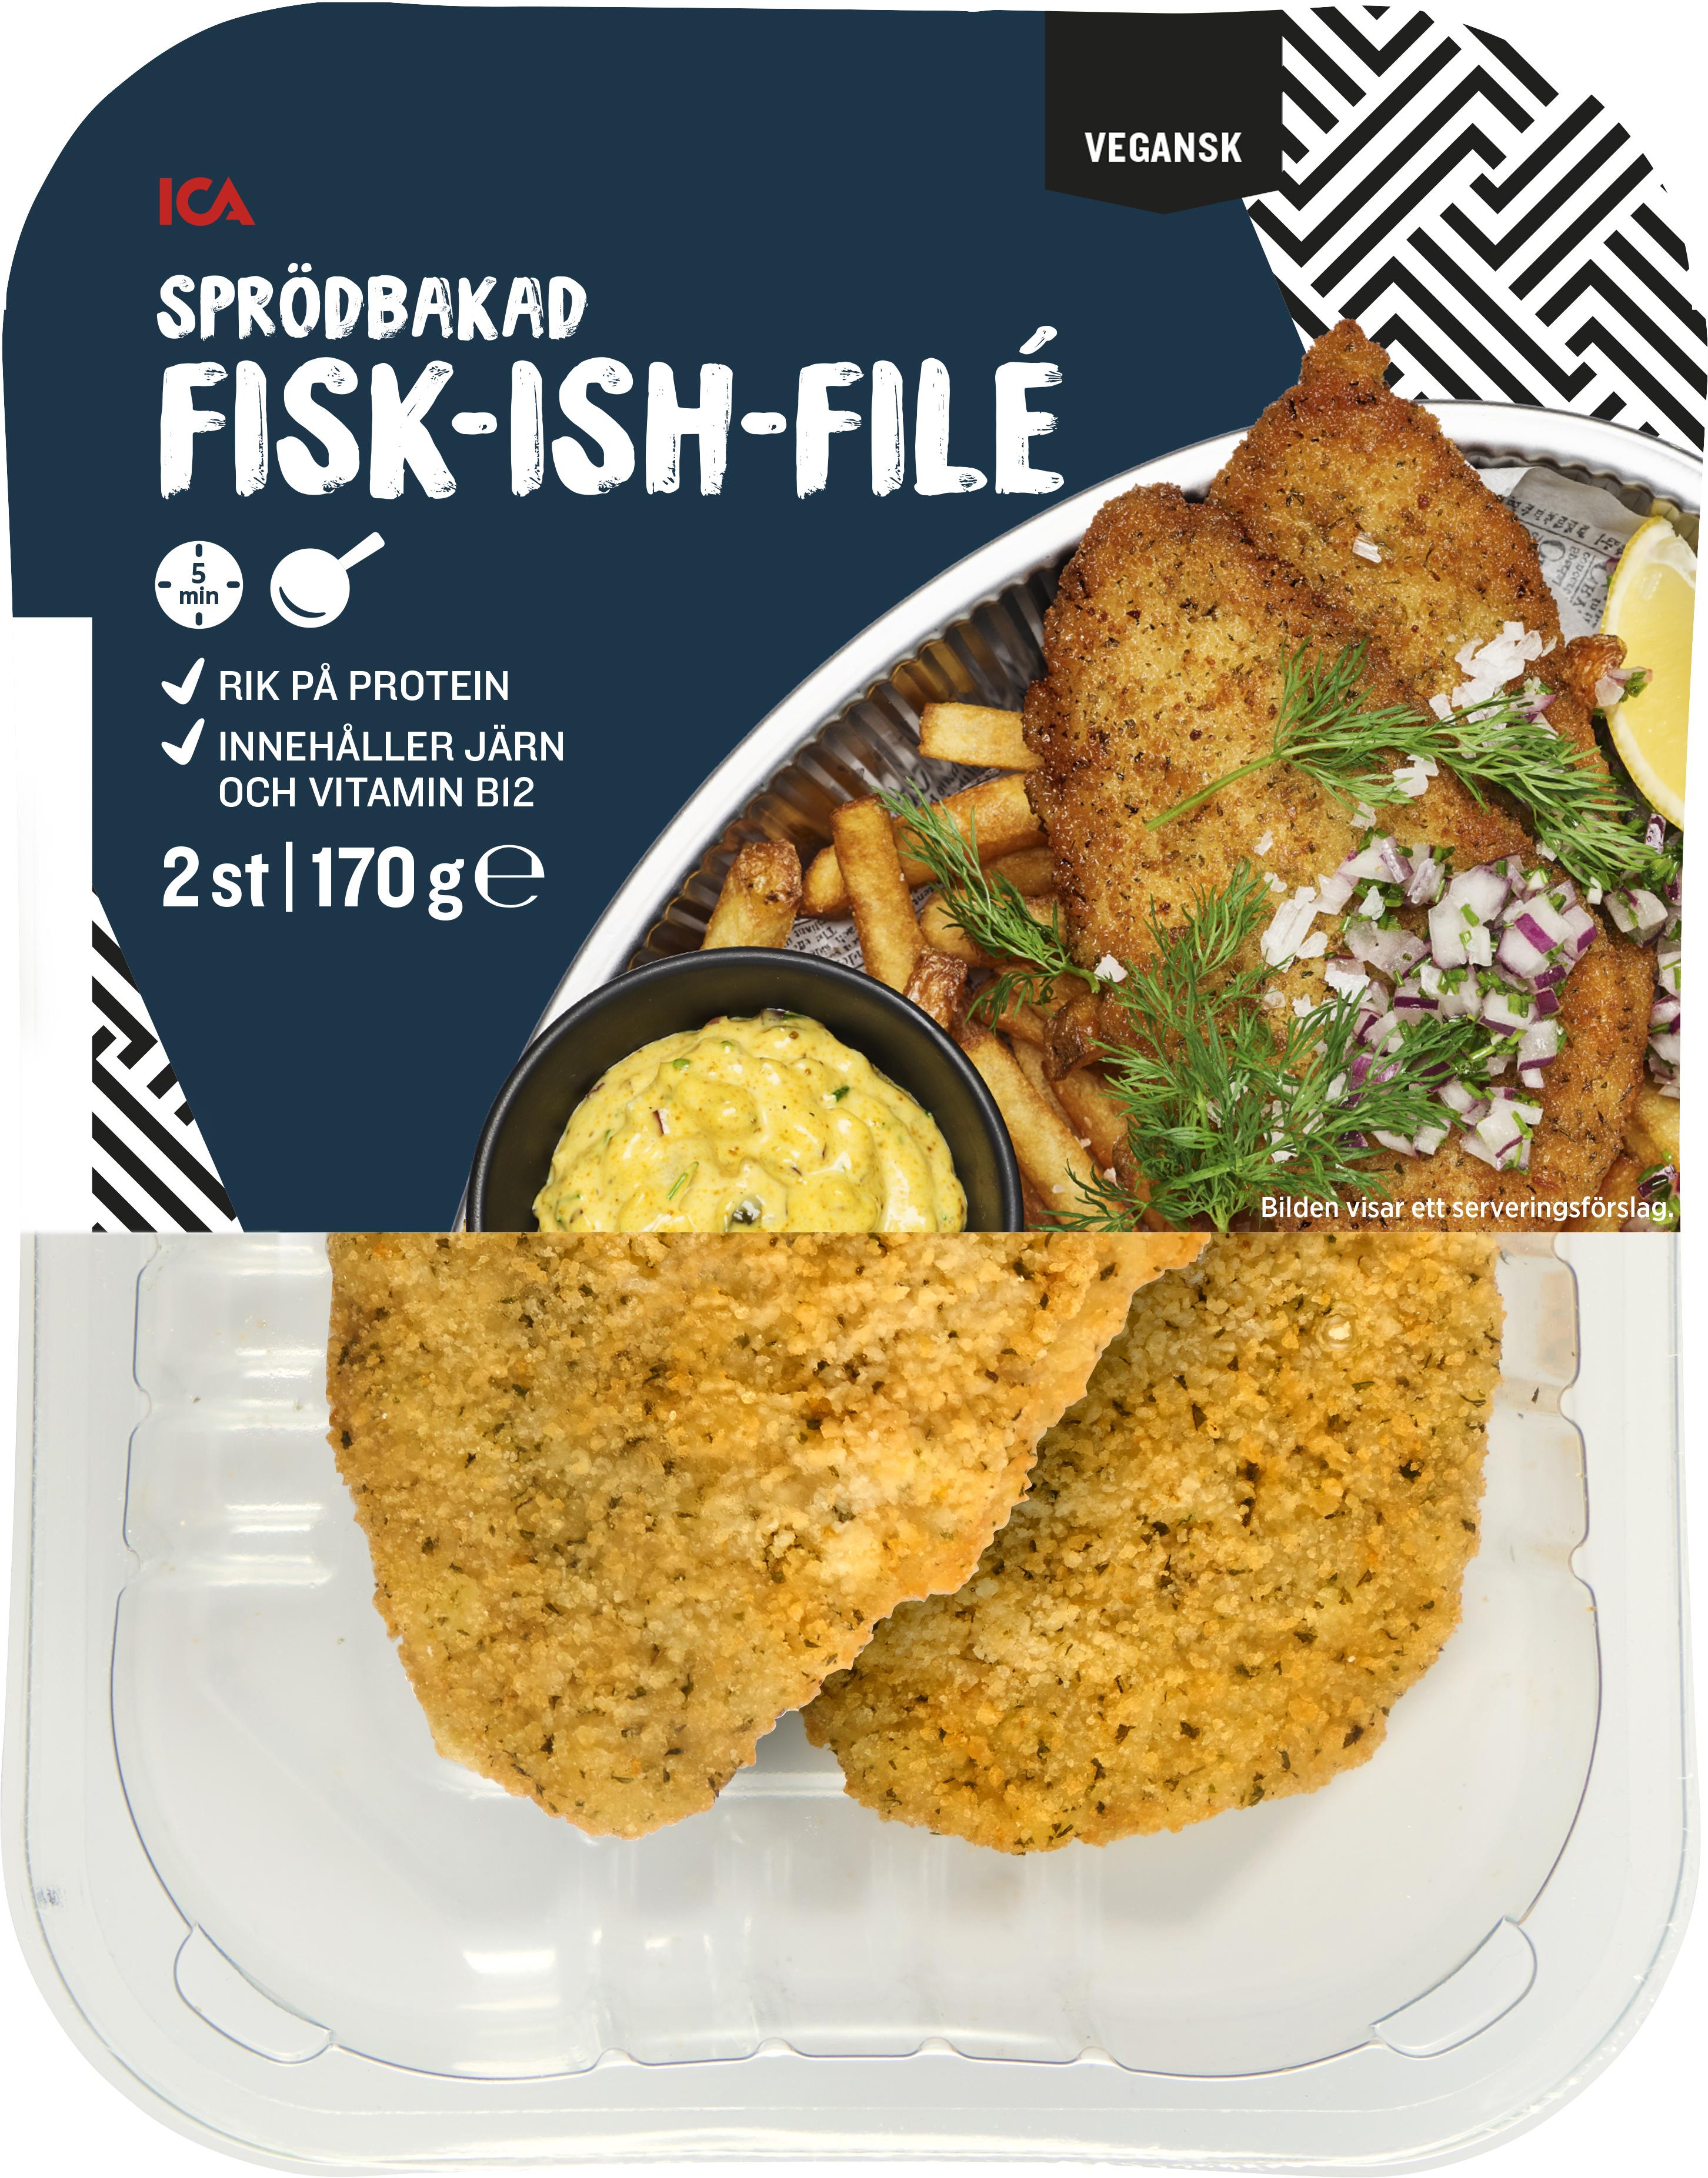 ICA Fisk-ish-file